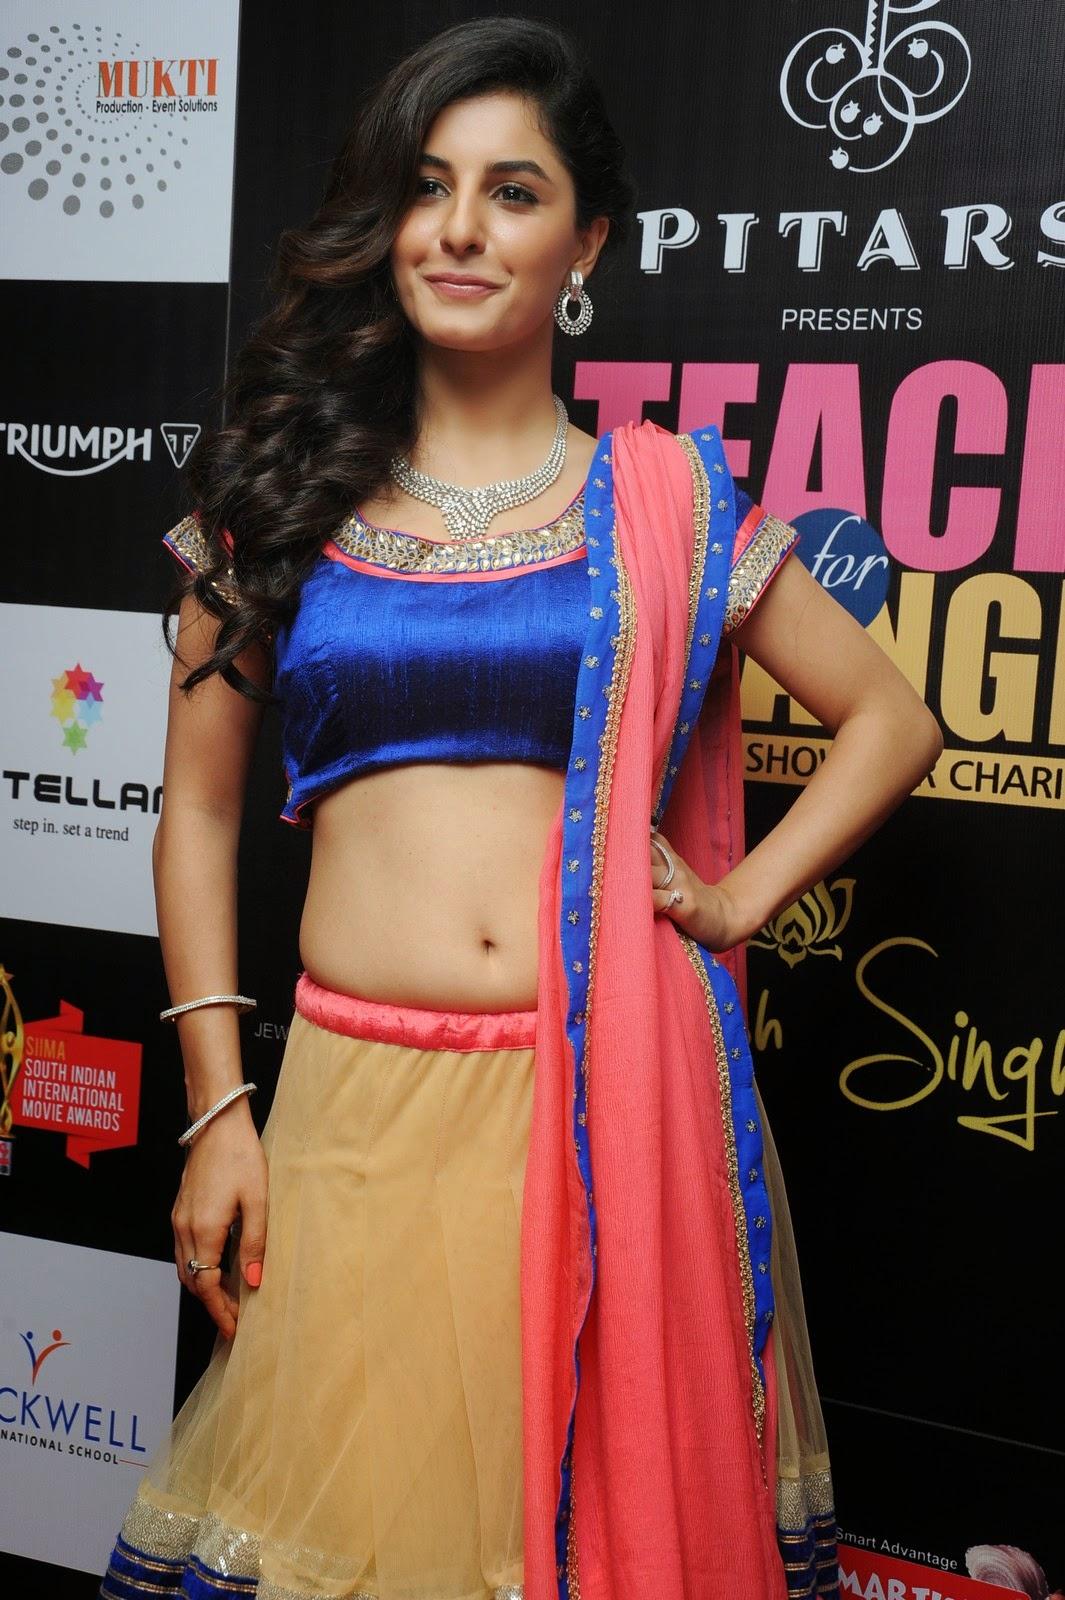 Isha talwar latest glam pics-HQ-Photo-16